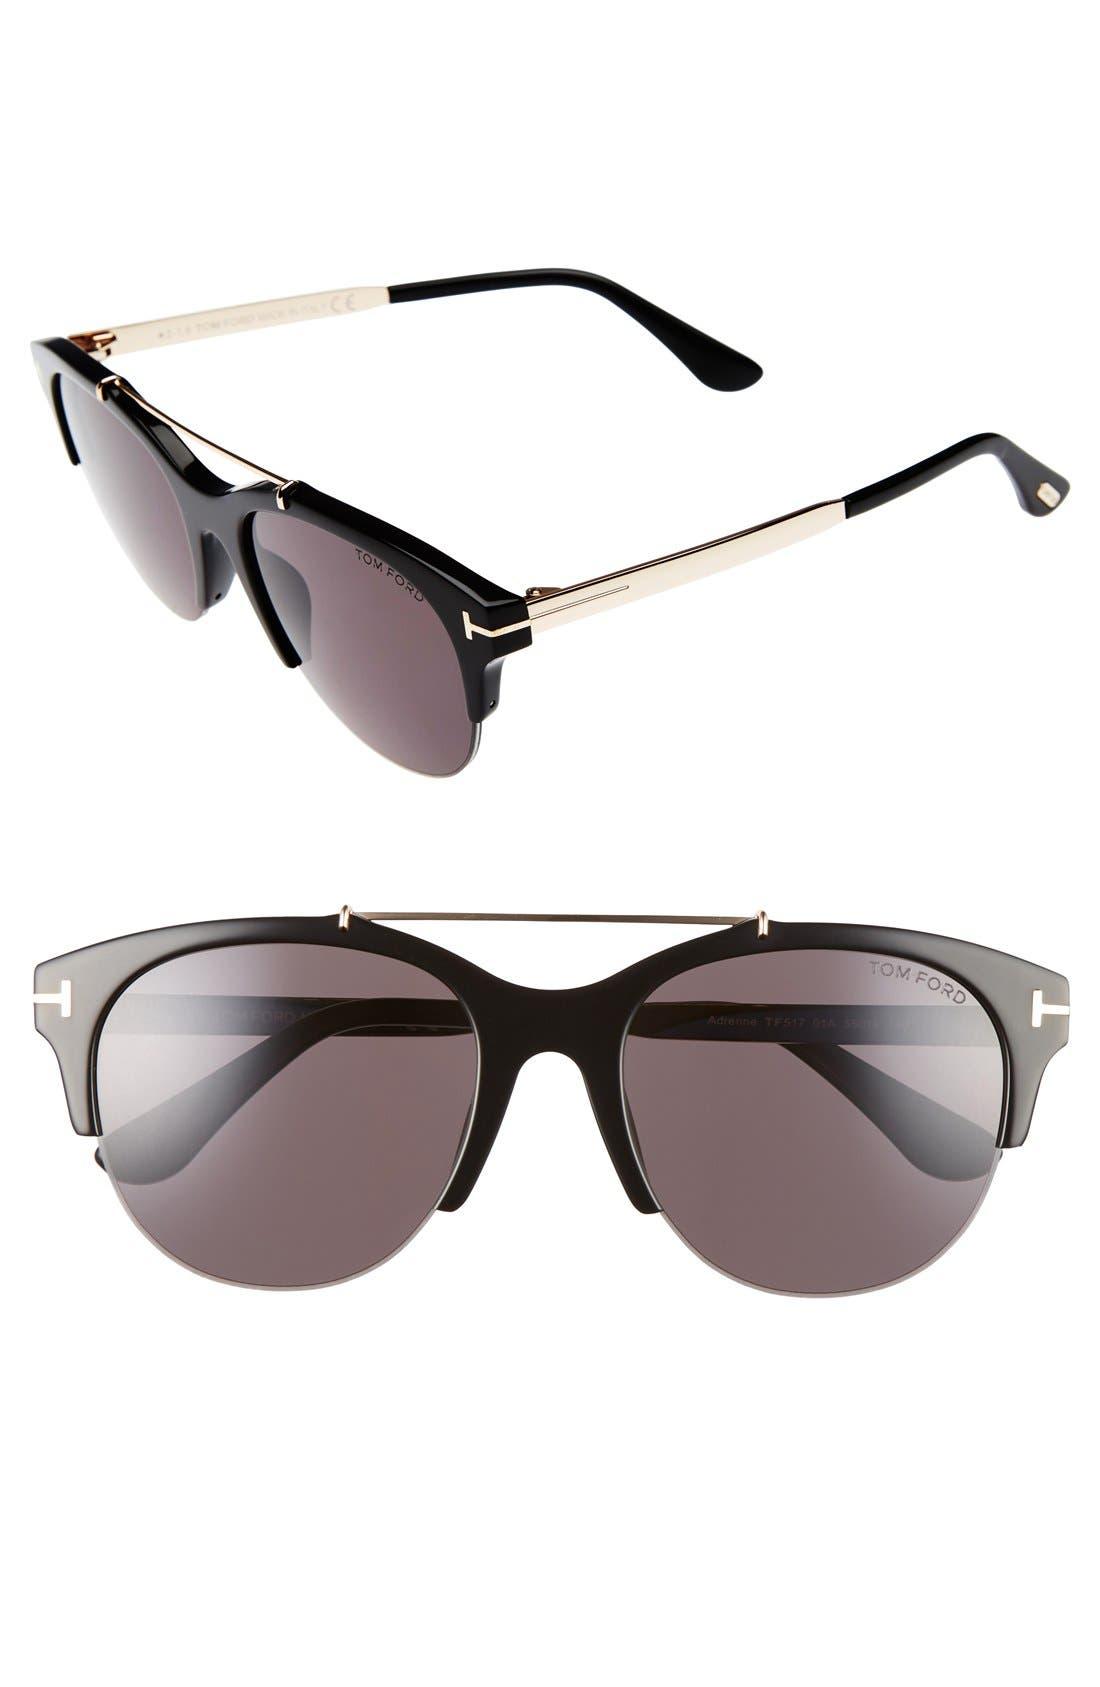 Adrenne 55mm Sunglasses,                             Main thumbnail 1, color,                             Black/ Rose Gold/ Smoke